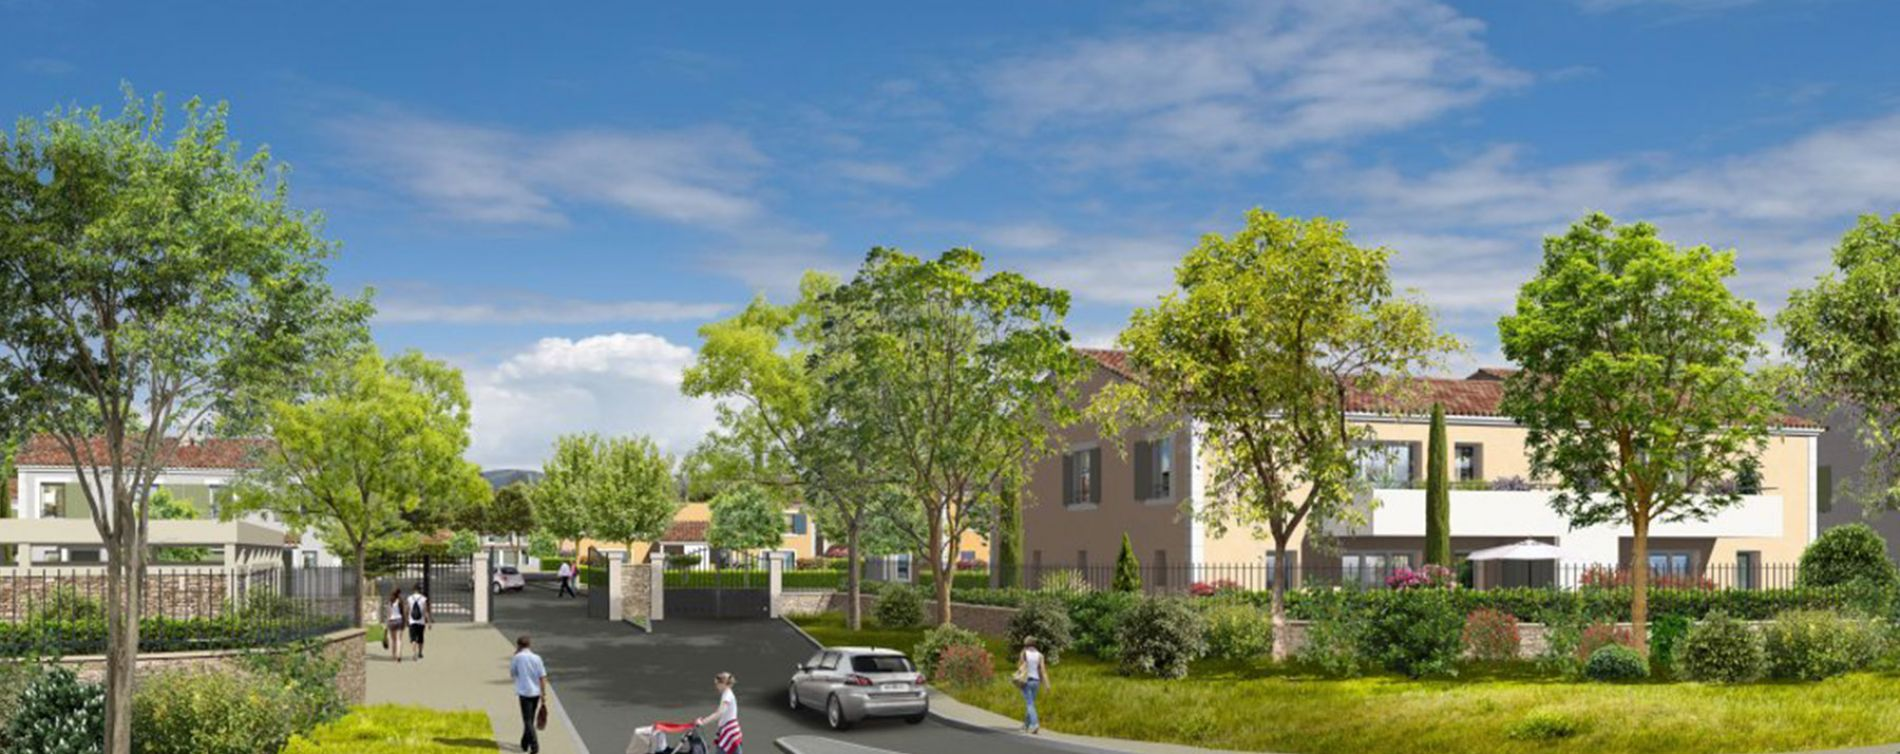 Pertuis : programme immobilier neuve « Luberance » (2)